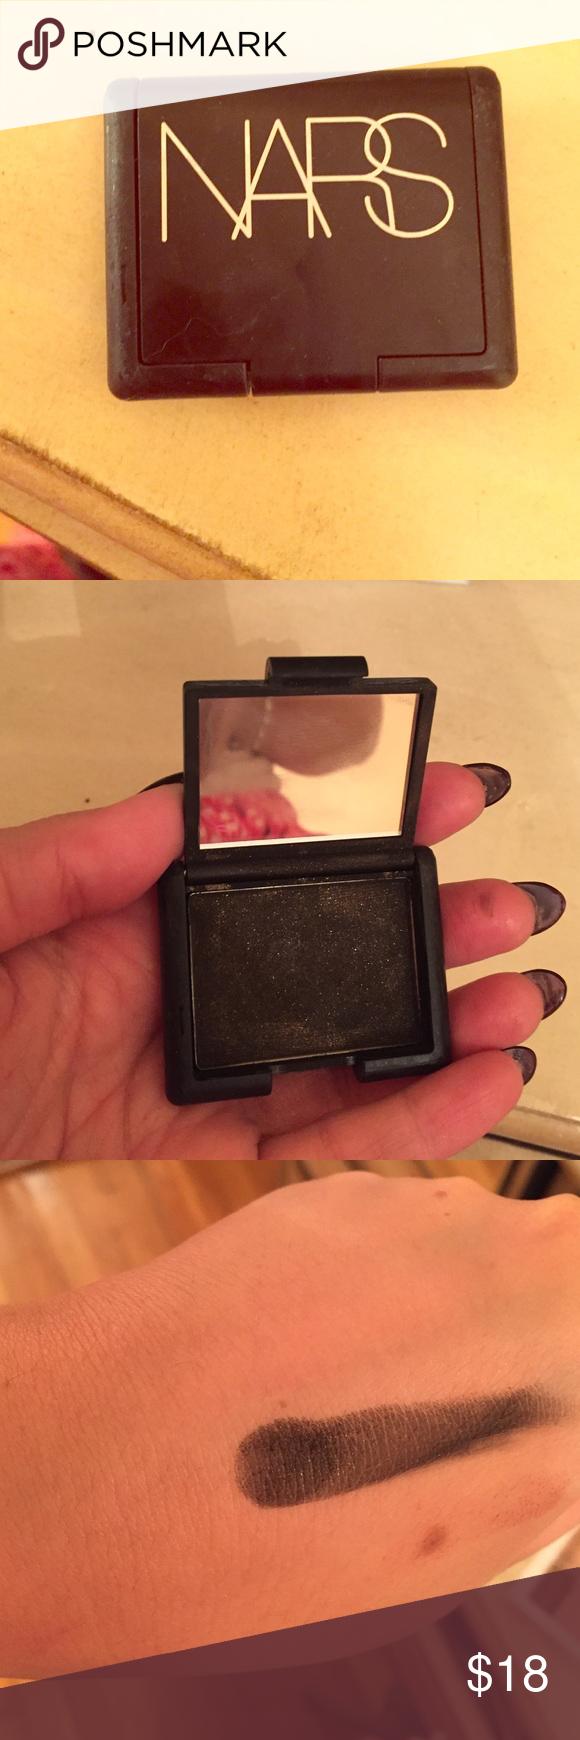 NARS nightclubbing eyeshadow used 2x! Black/gold NARS nightclubbing eyeshadow used 2x! Black/gold glitter NARS Makeup Eyeshadow